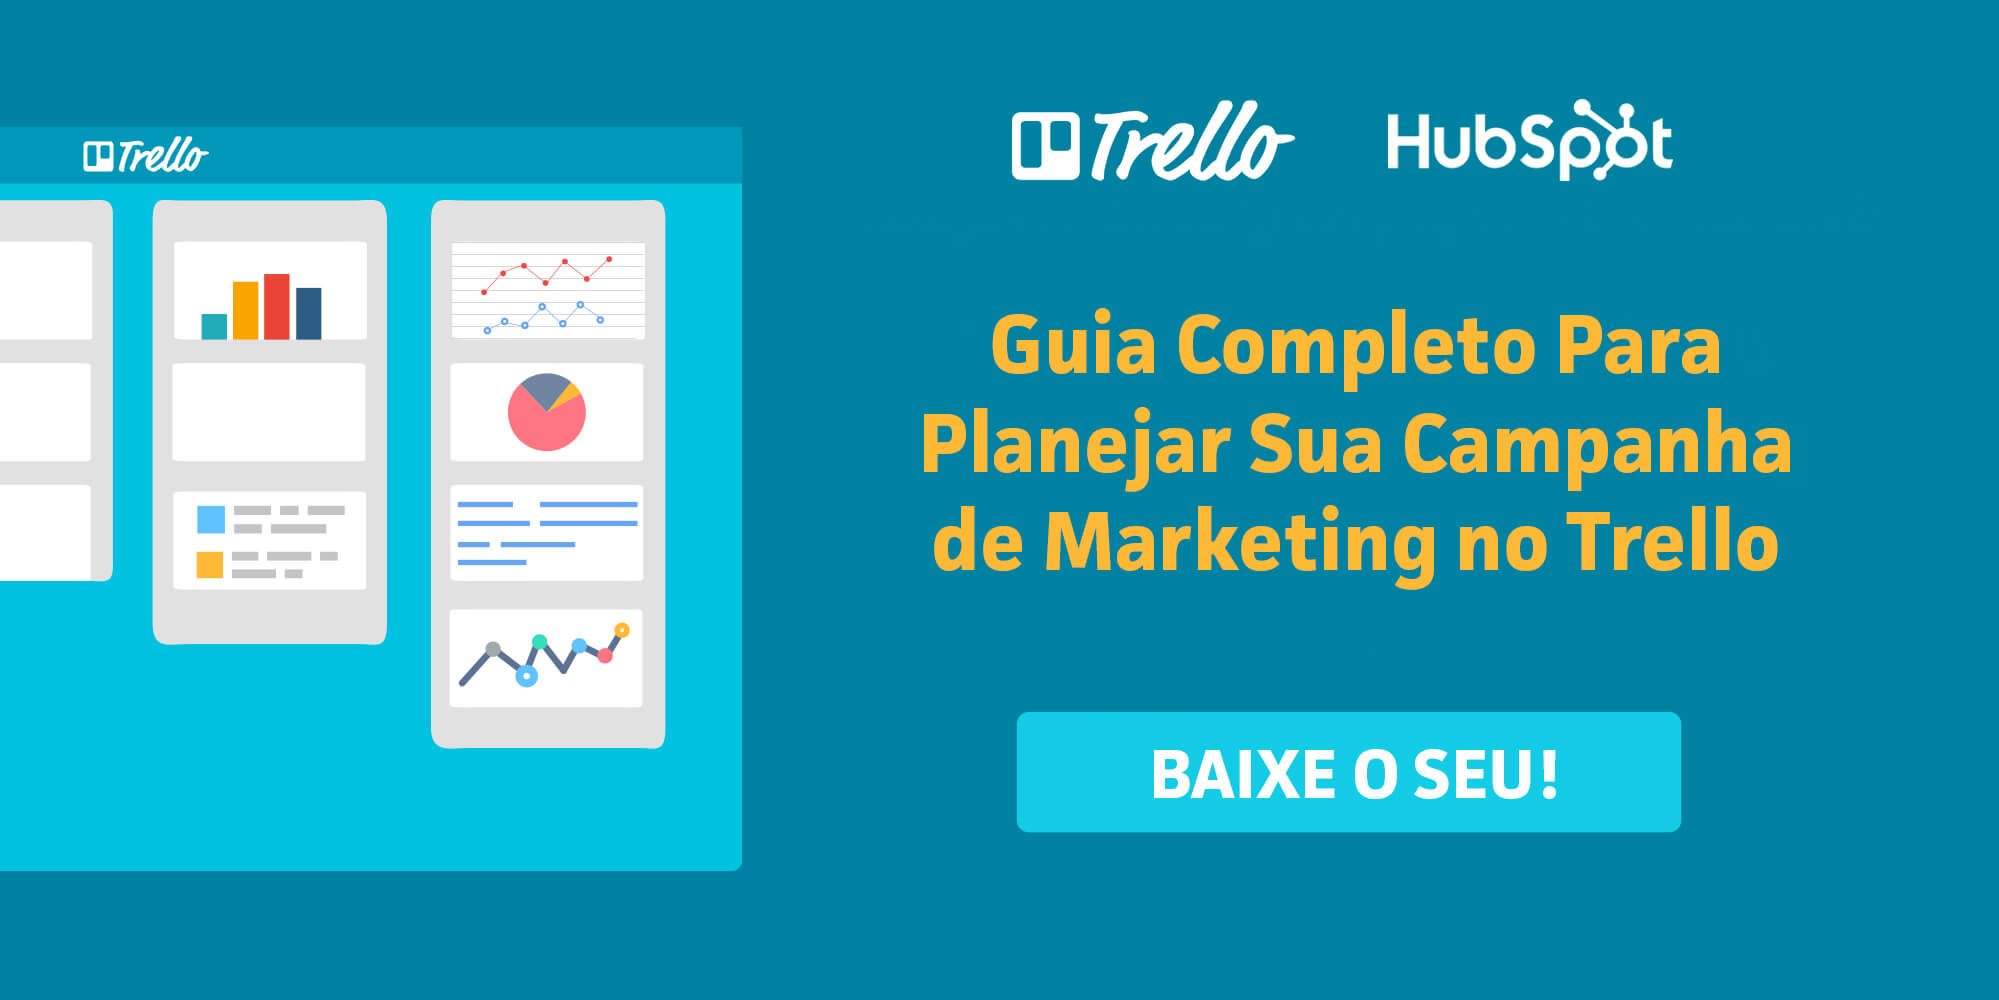 ebook-campanha-de-marketing-trello-hubspot